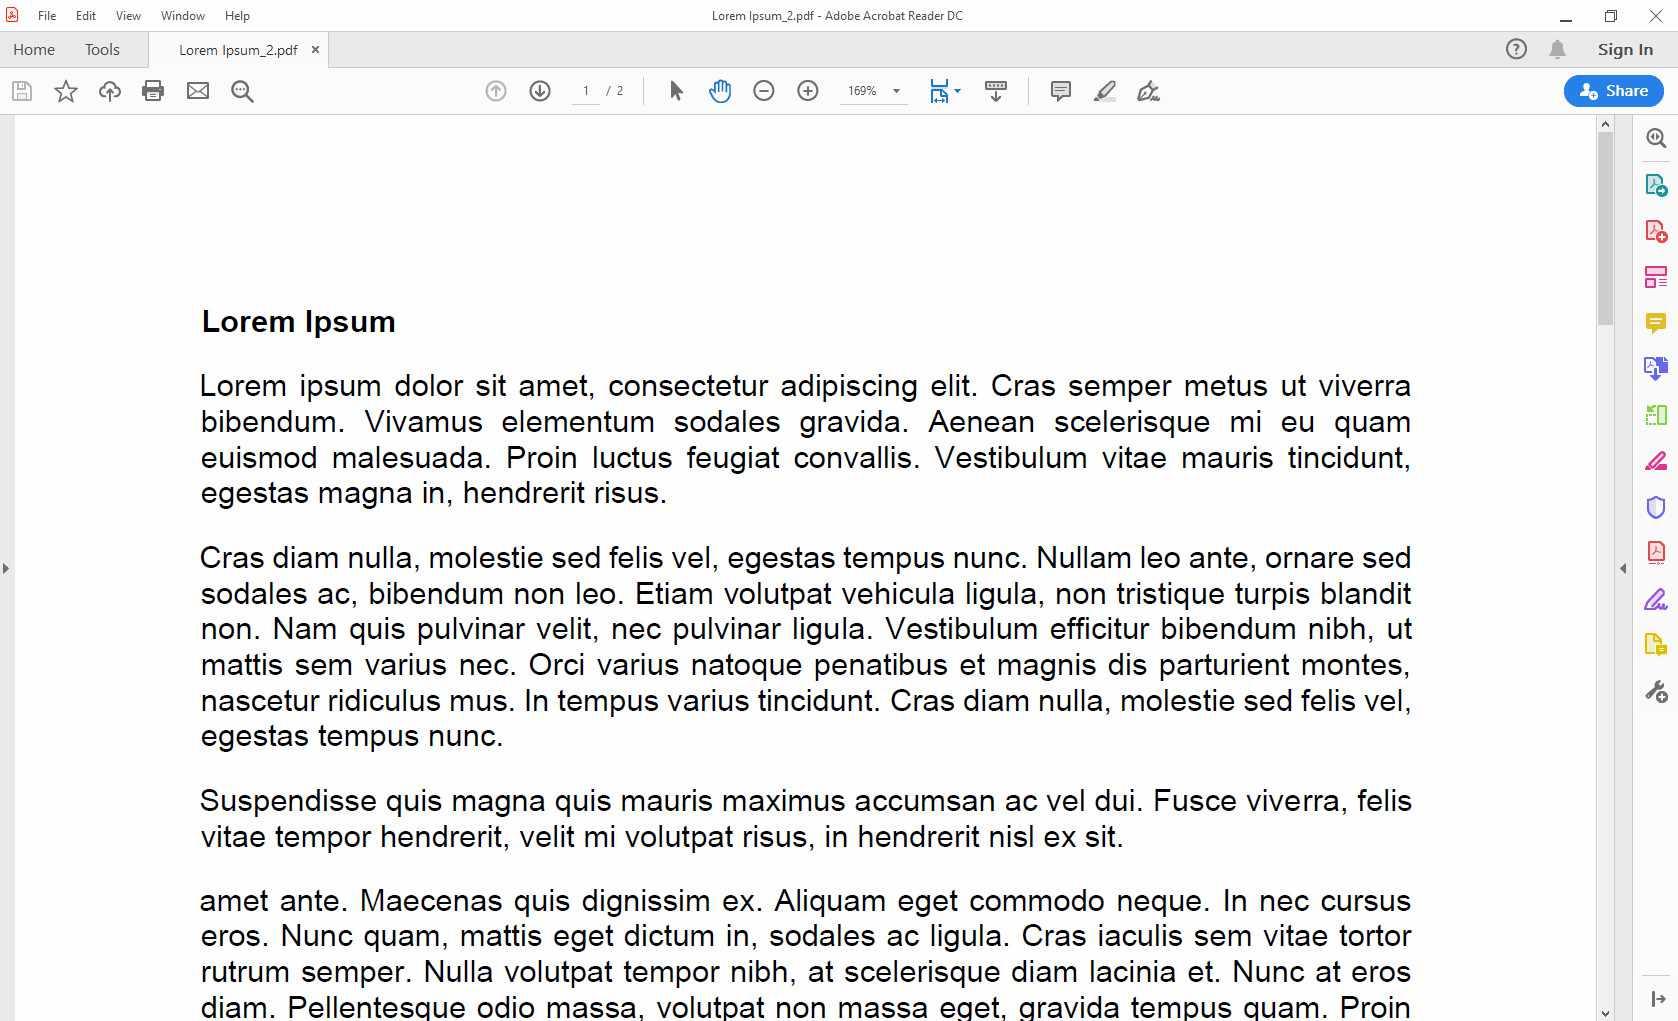 Adobe Acrobat Reader with new PDF open